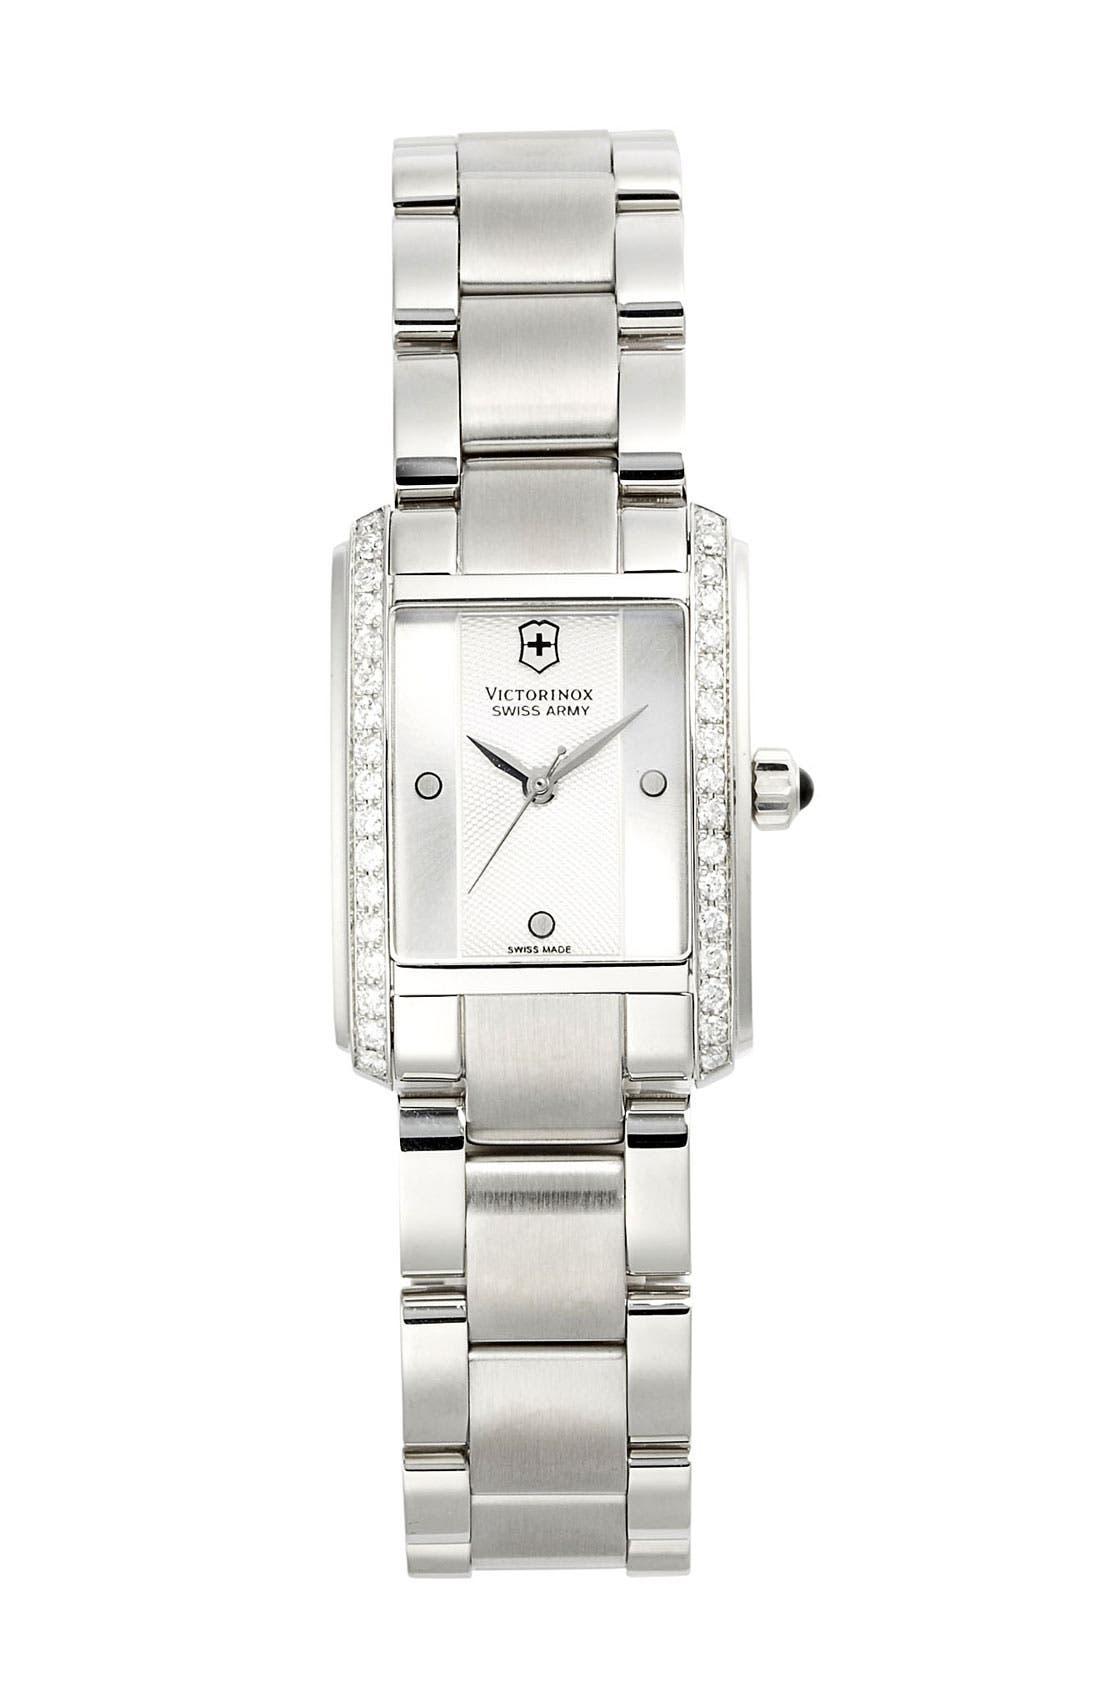 Main Image - Victorinox Swiss Army® 'Vivante' Rectangular Diamond Case Bracelet Watch, 21mm x 30mm